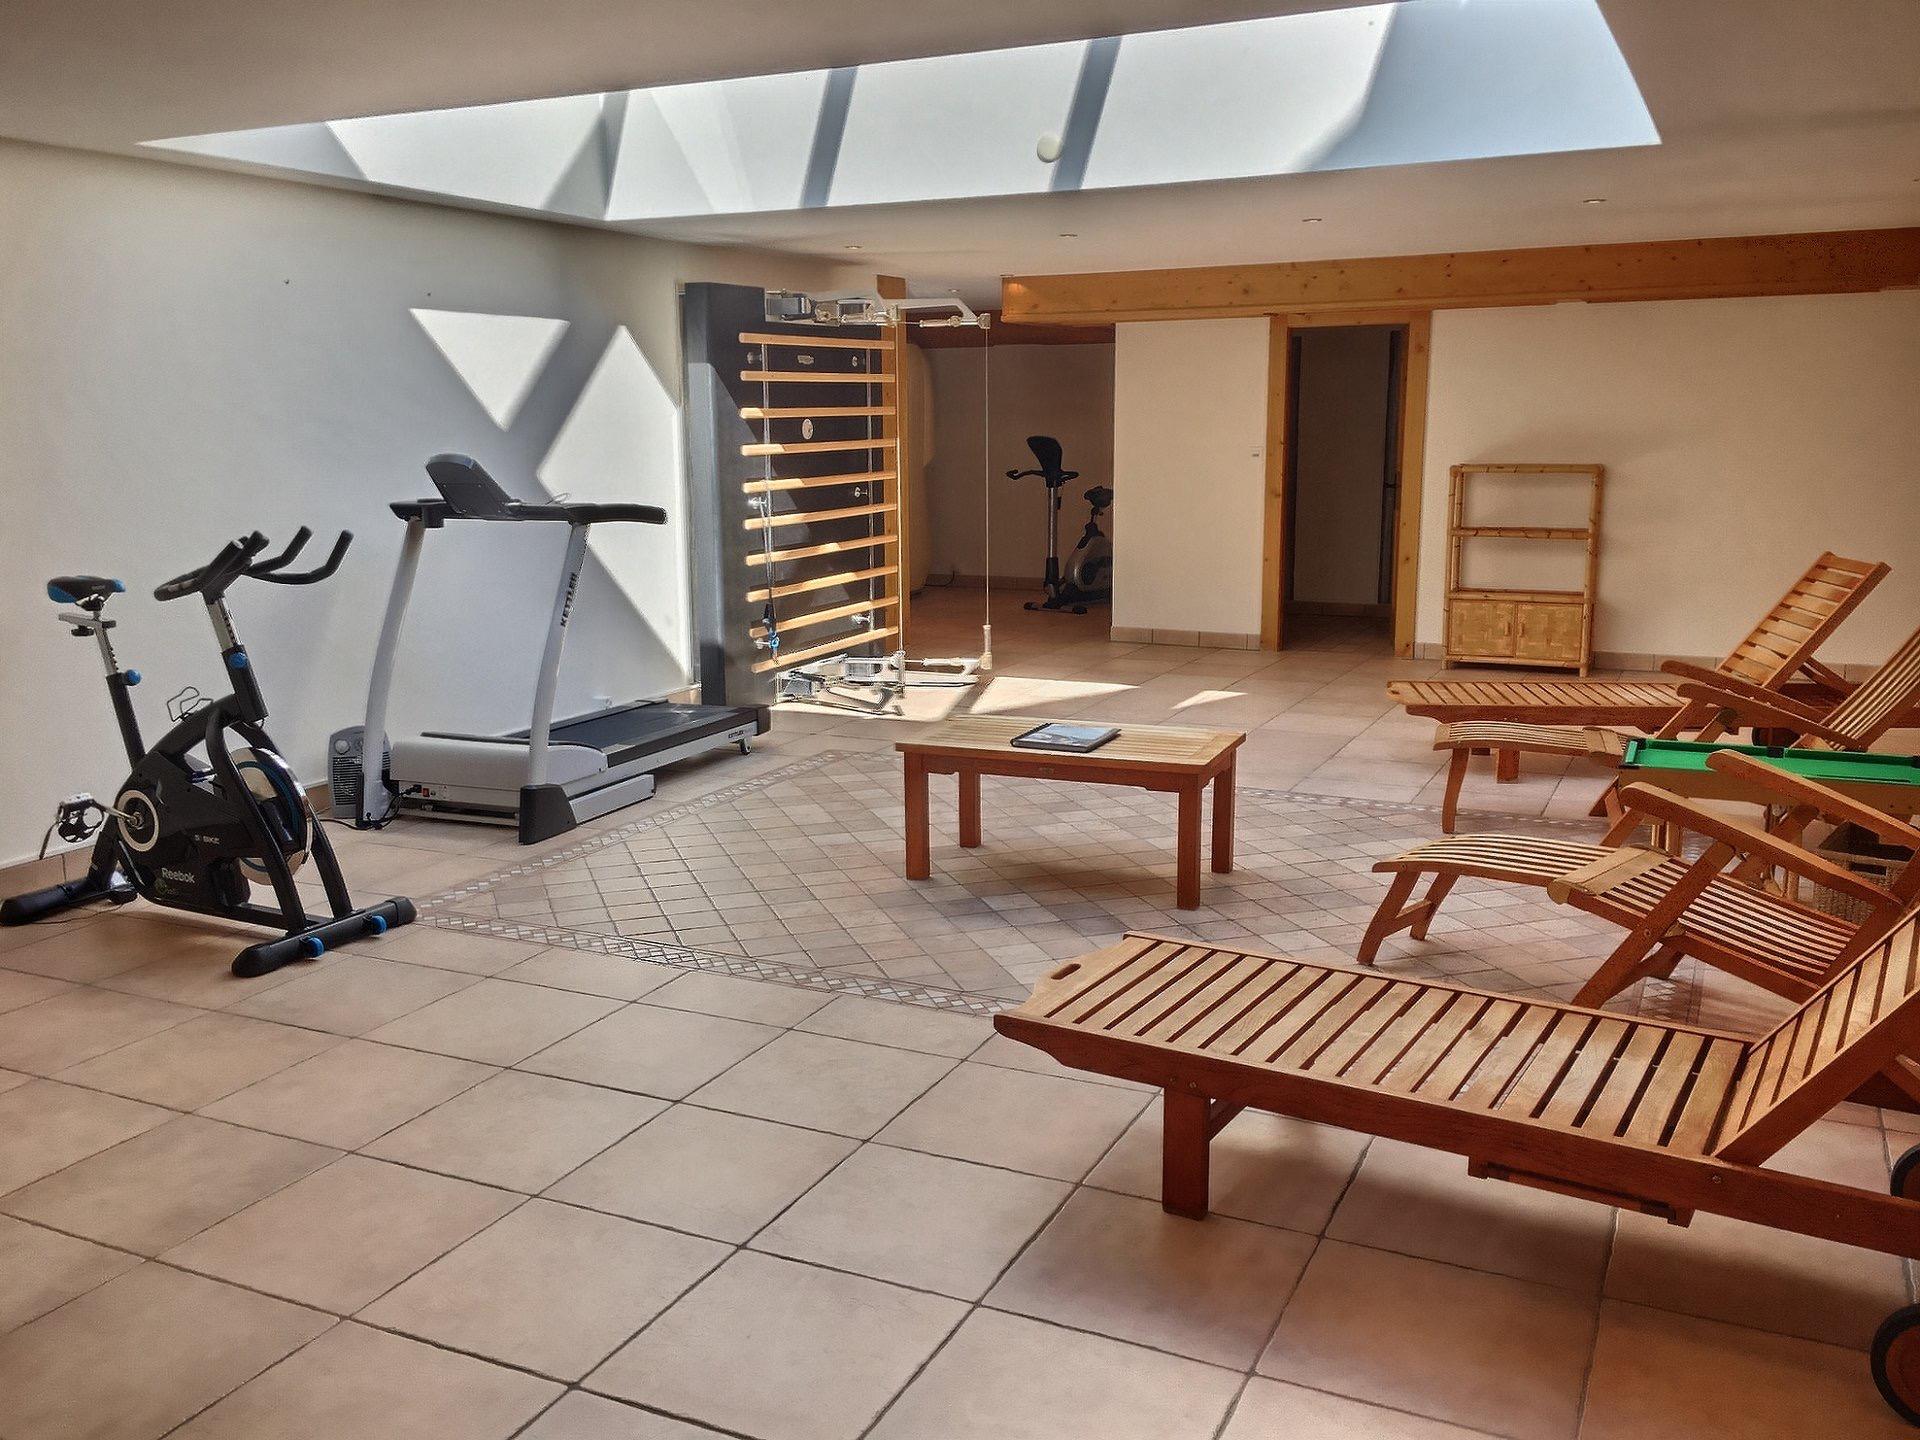 Яркая и солнечная квартира в Швейцарии, недалеко от 'Les Esserts' на курорте Вербье